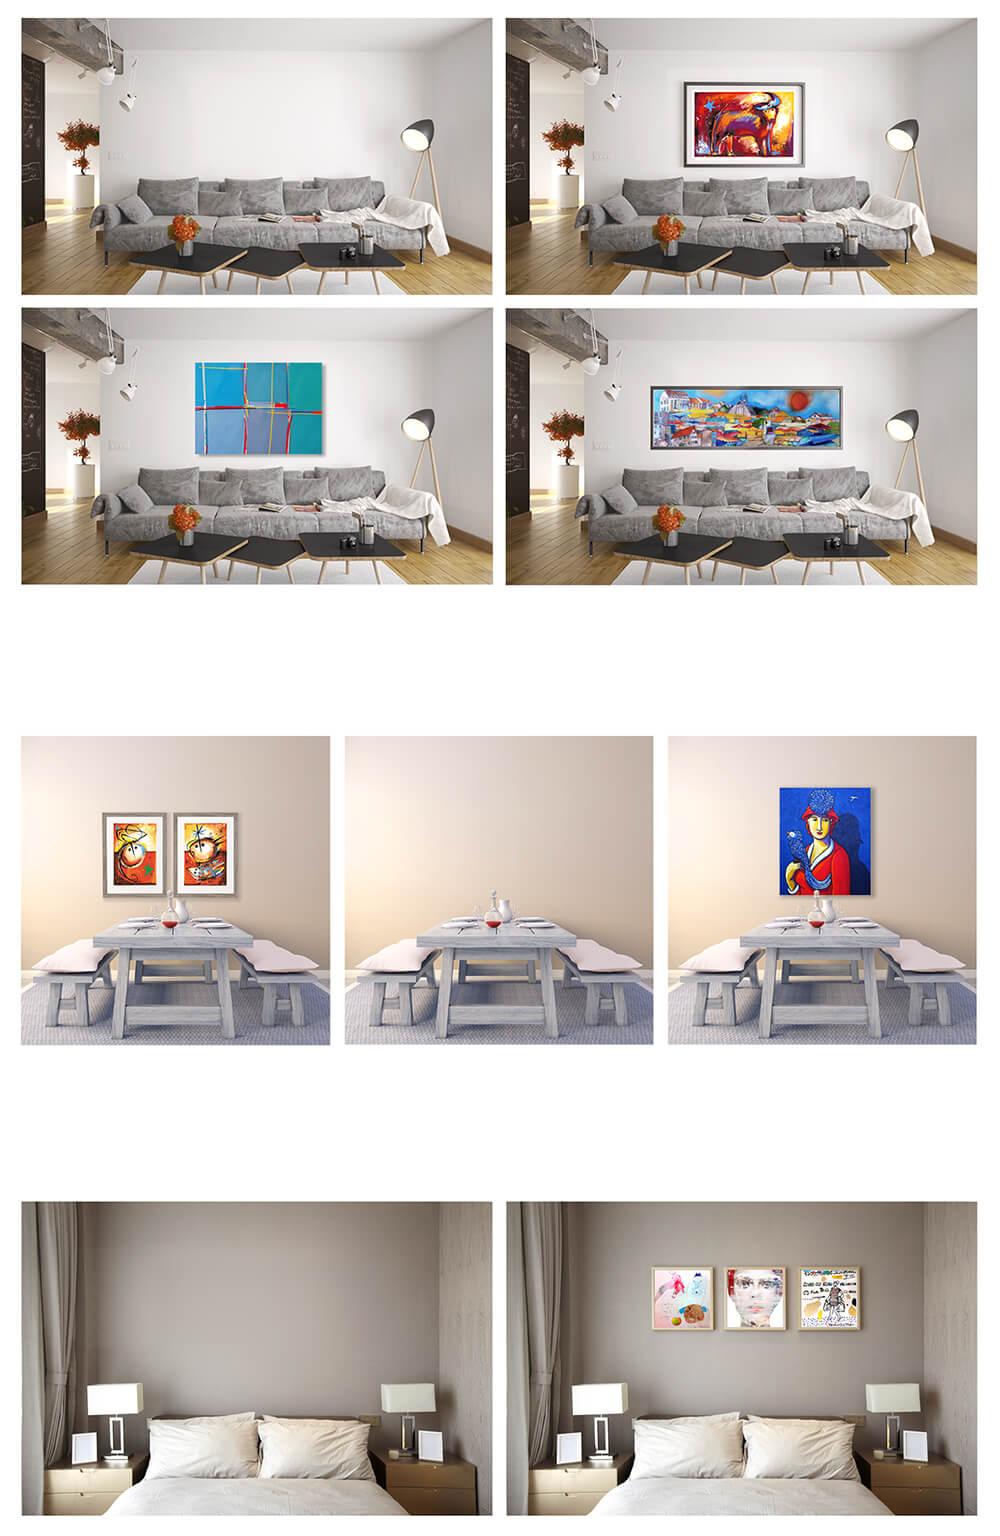 kunst advies van AquArtisGallery Amsterdam